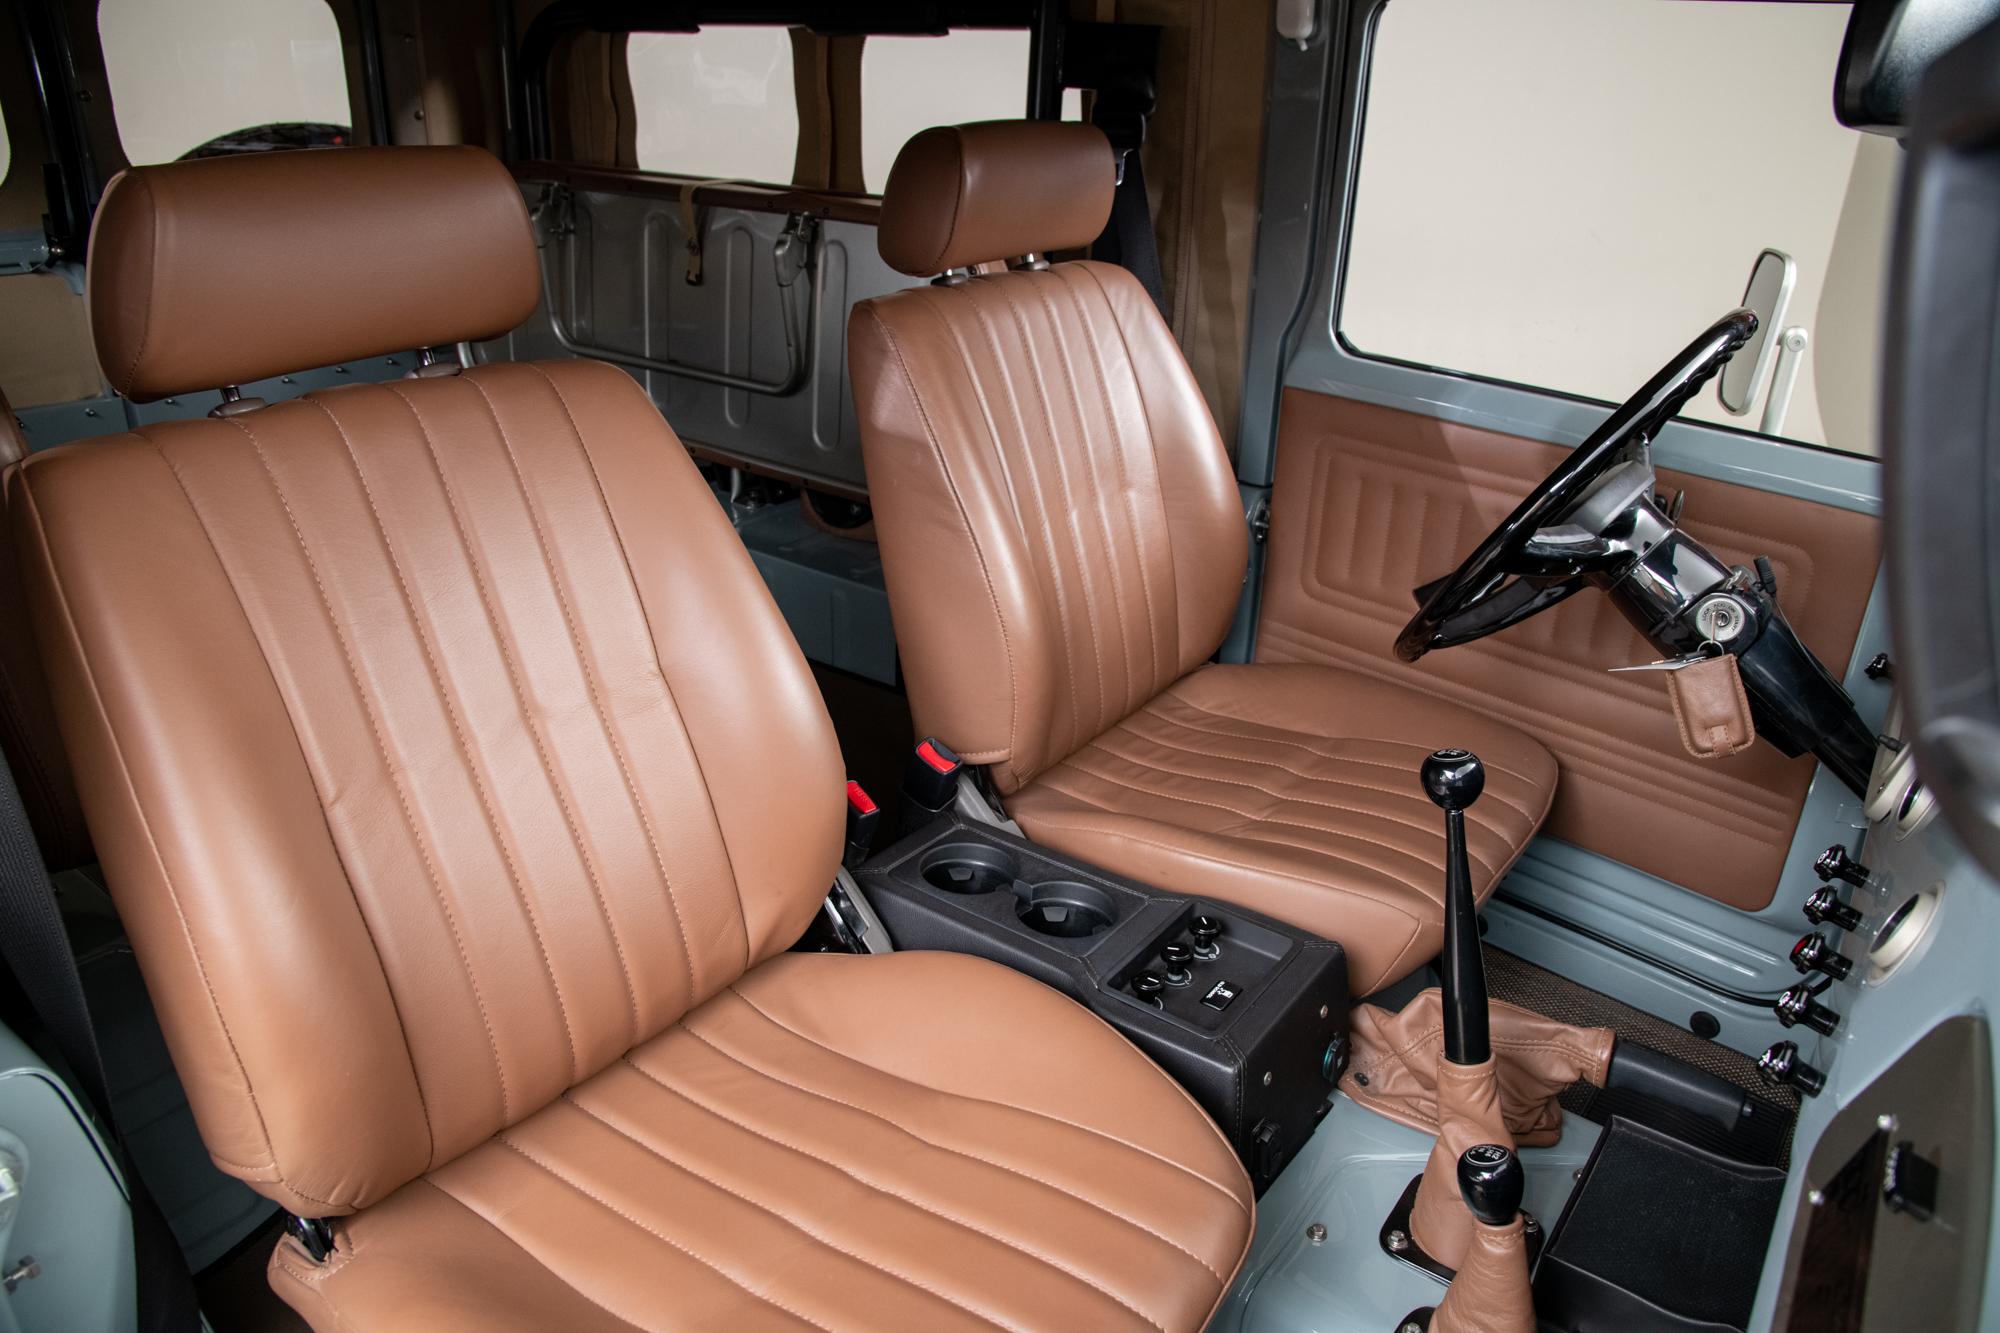 1979 Toyota FJ43 Land Cruiser , HEATH GRAY, VIN FJ4359705, MILEAGE 1819